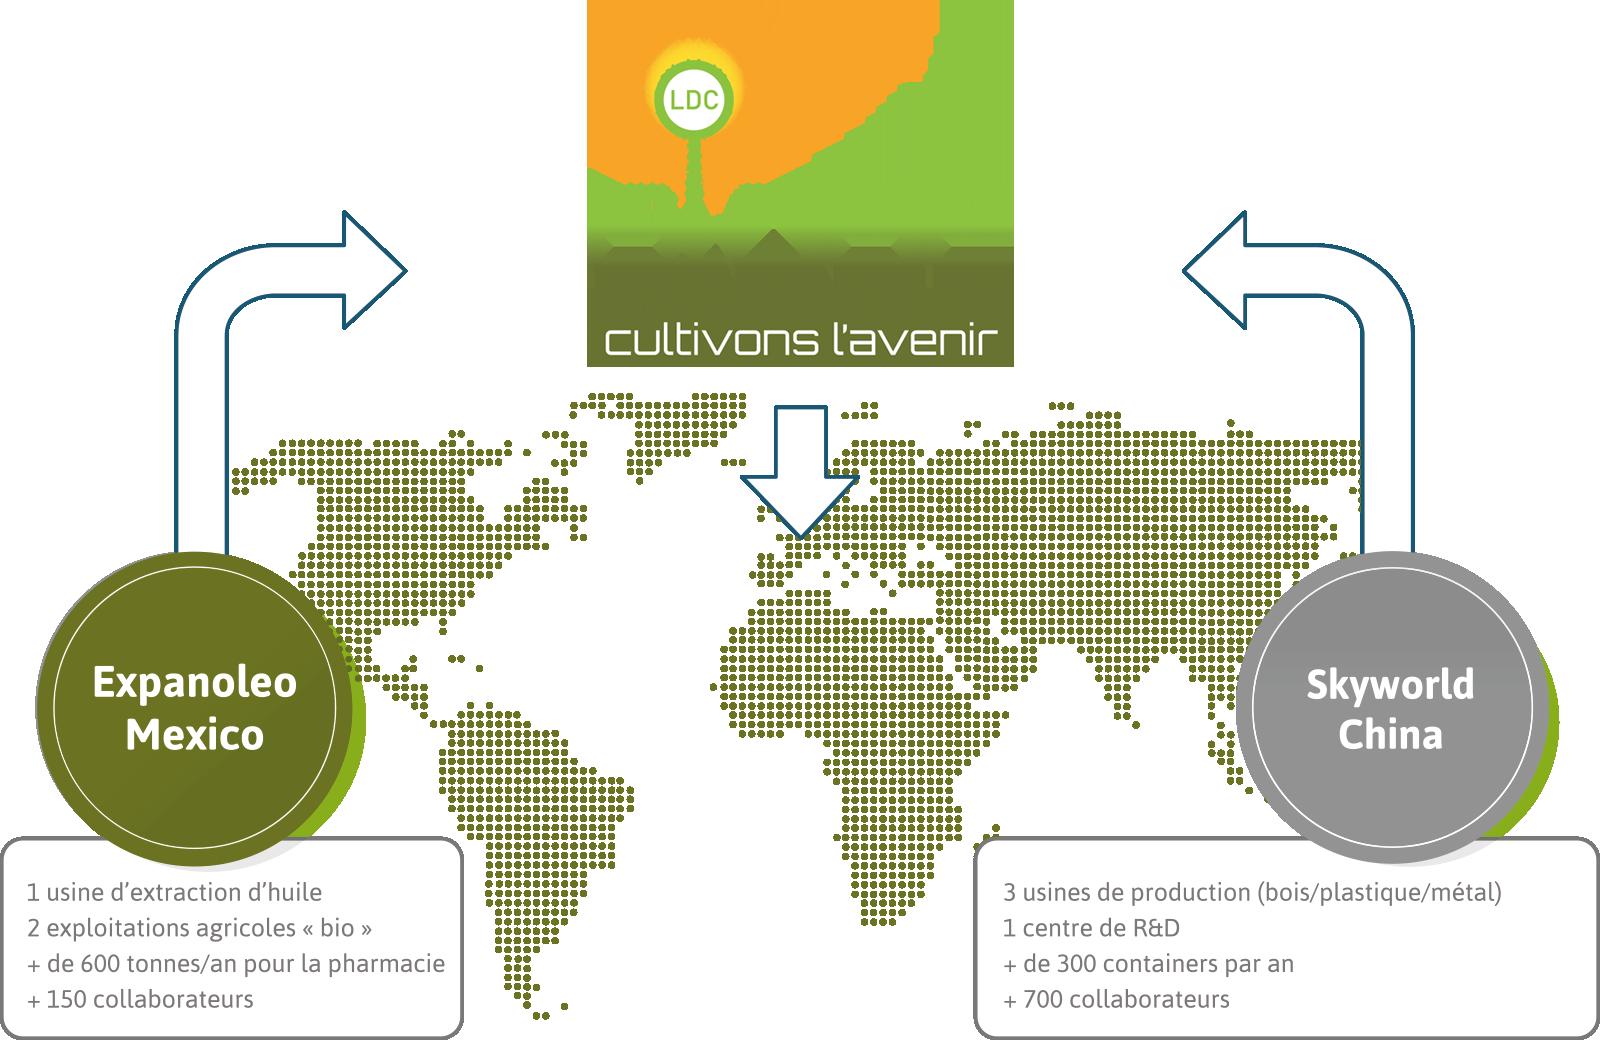 carte partenaires ldc algae